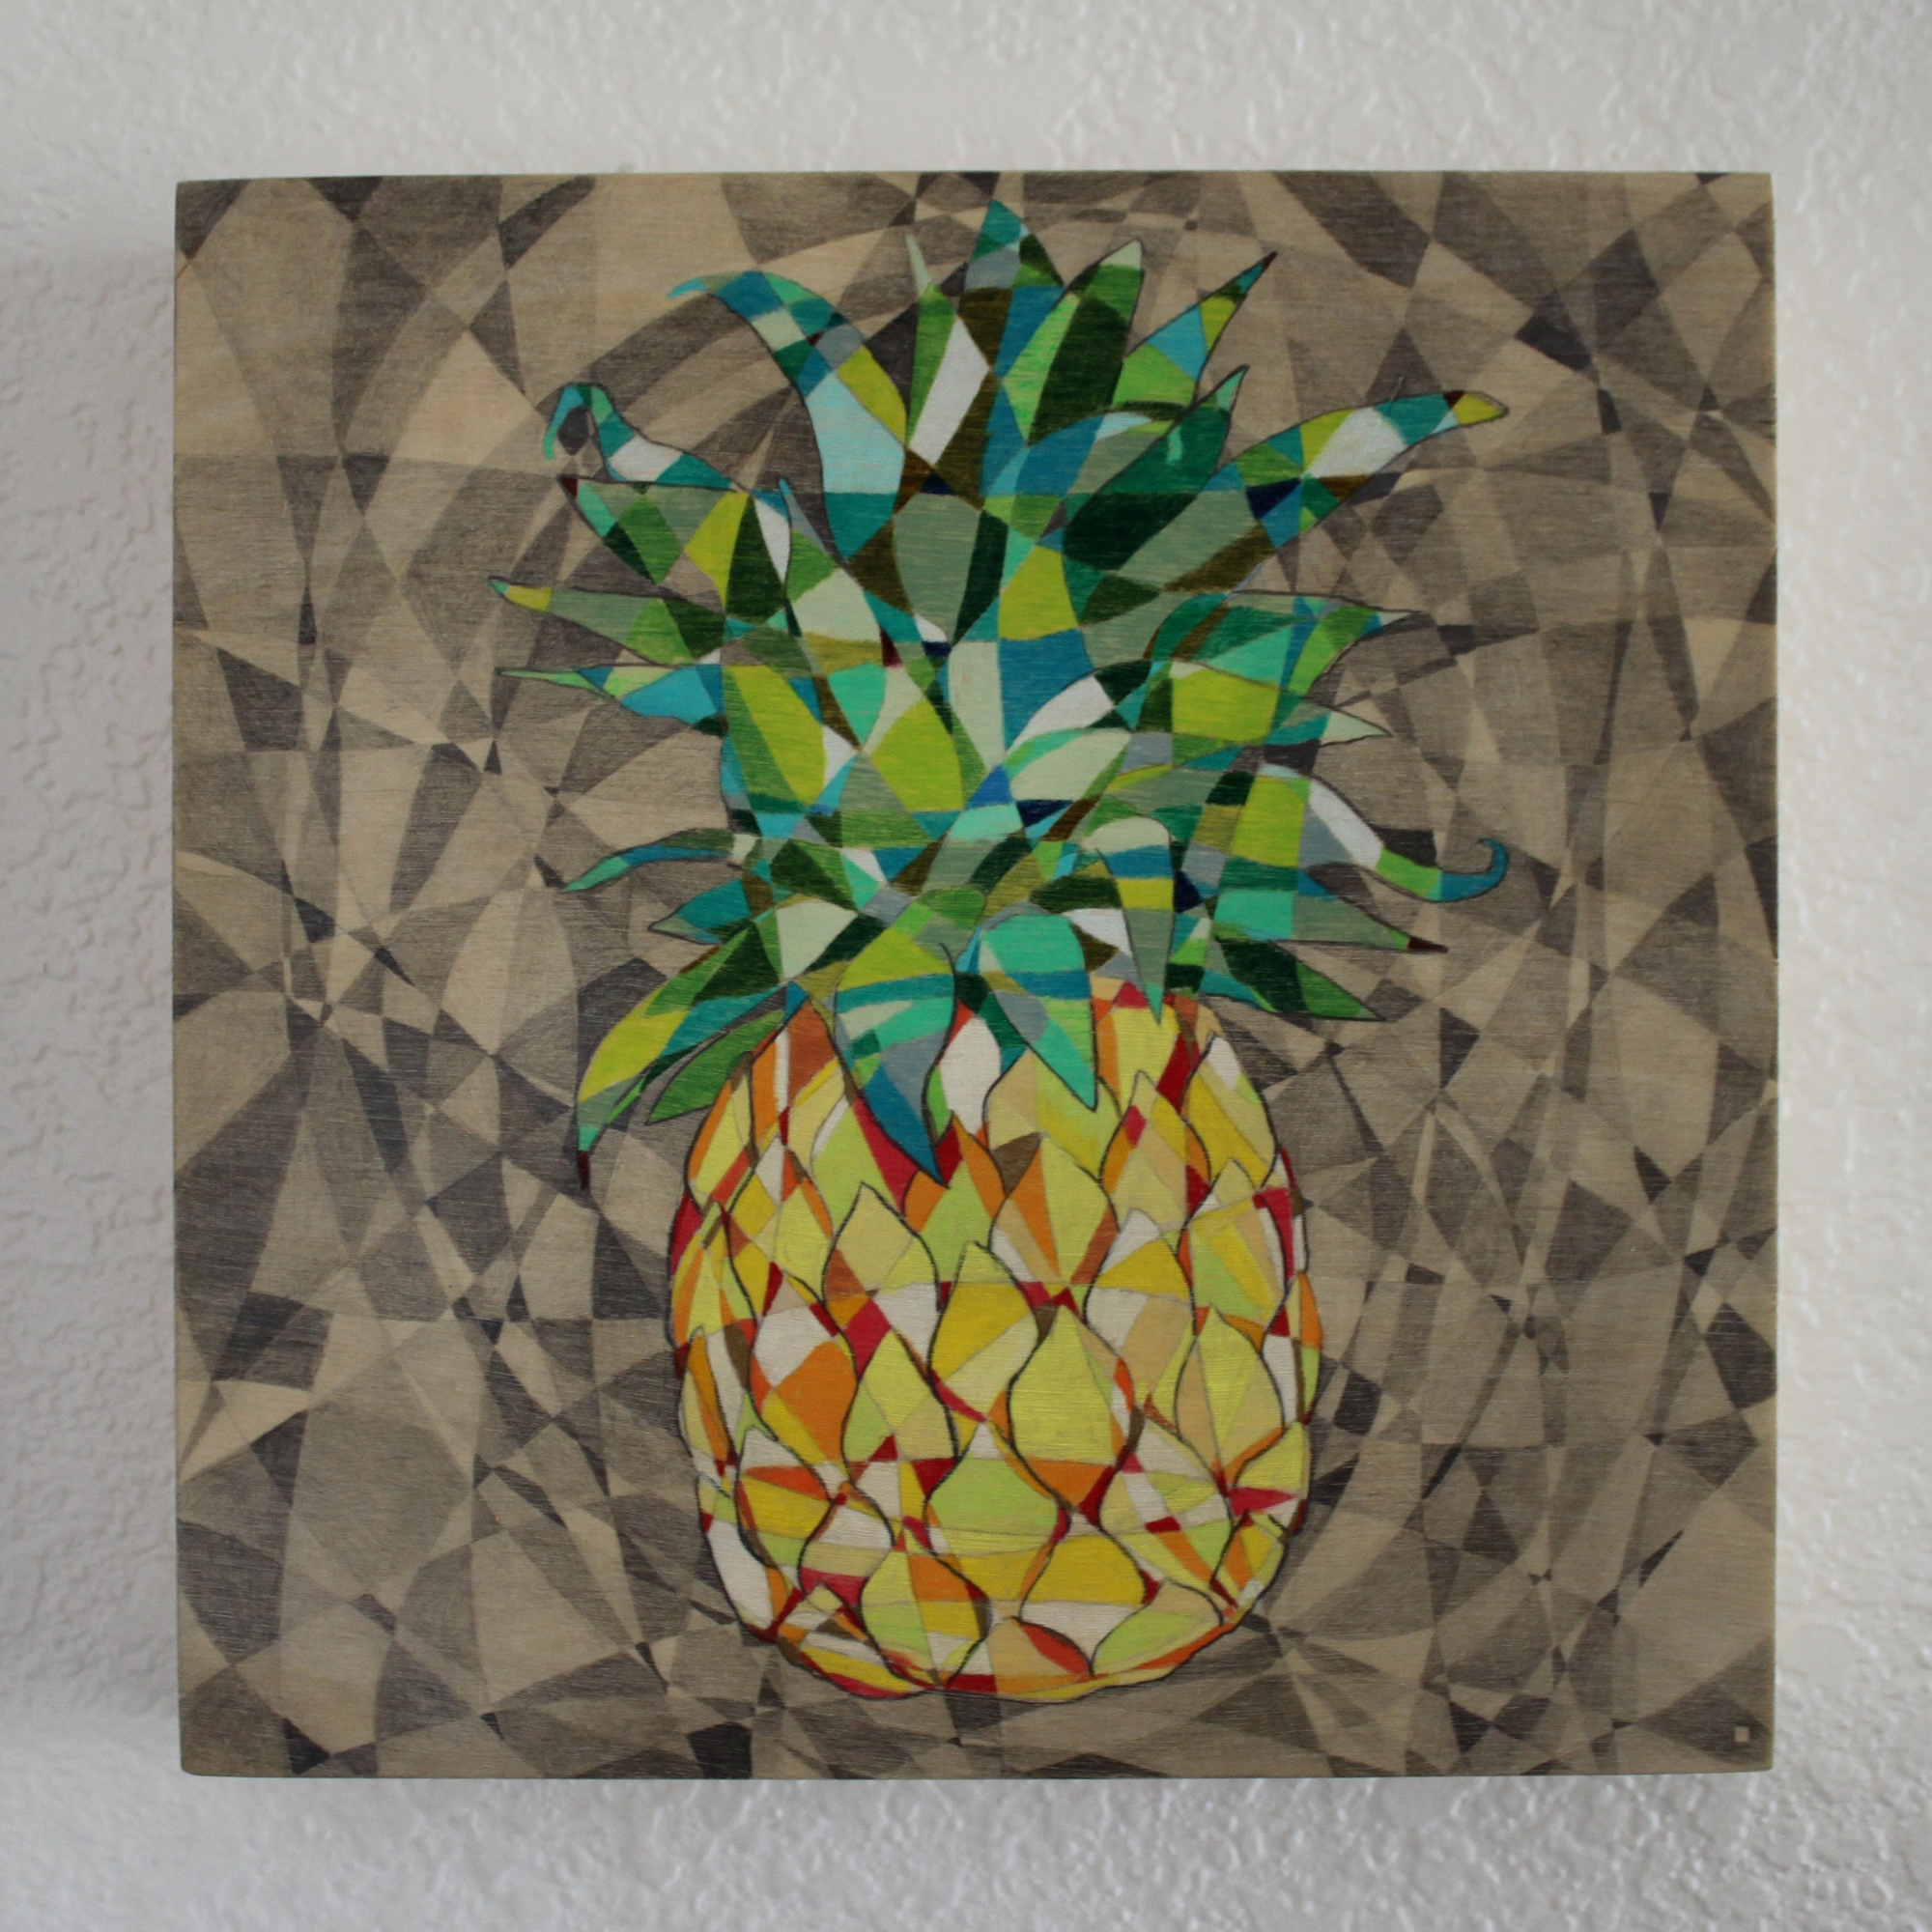 Pineapple Pencil on Panel 8in x 8in 2015 Boz Schurr.jpg